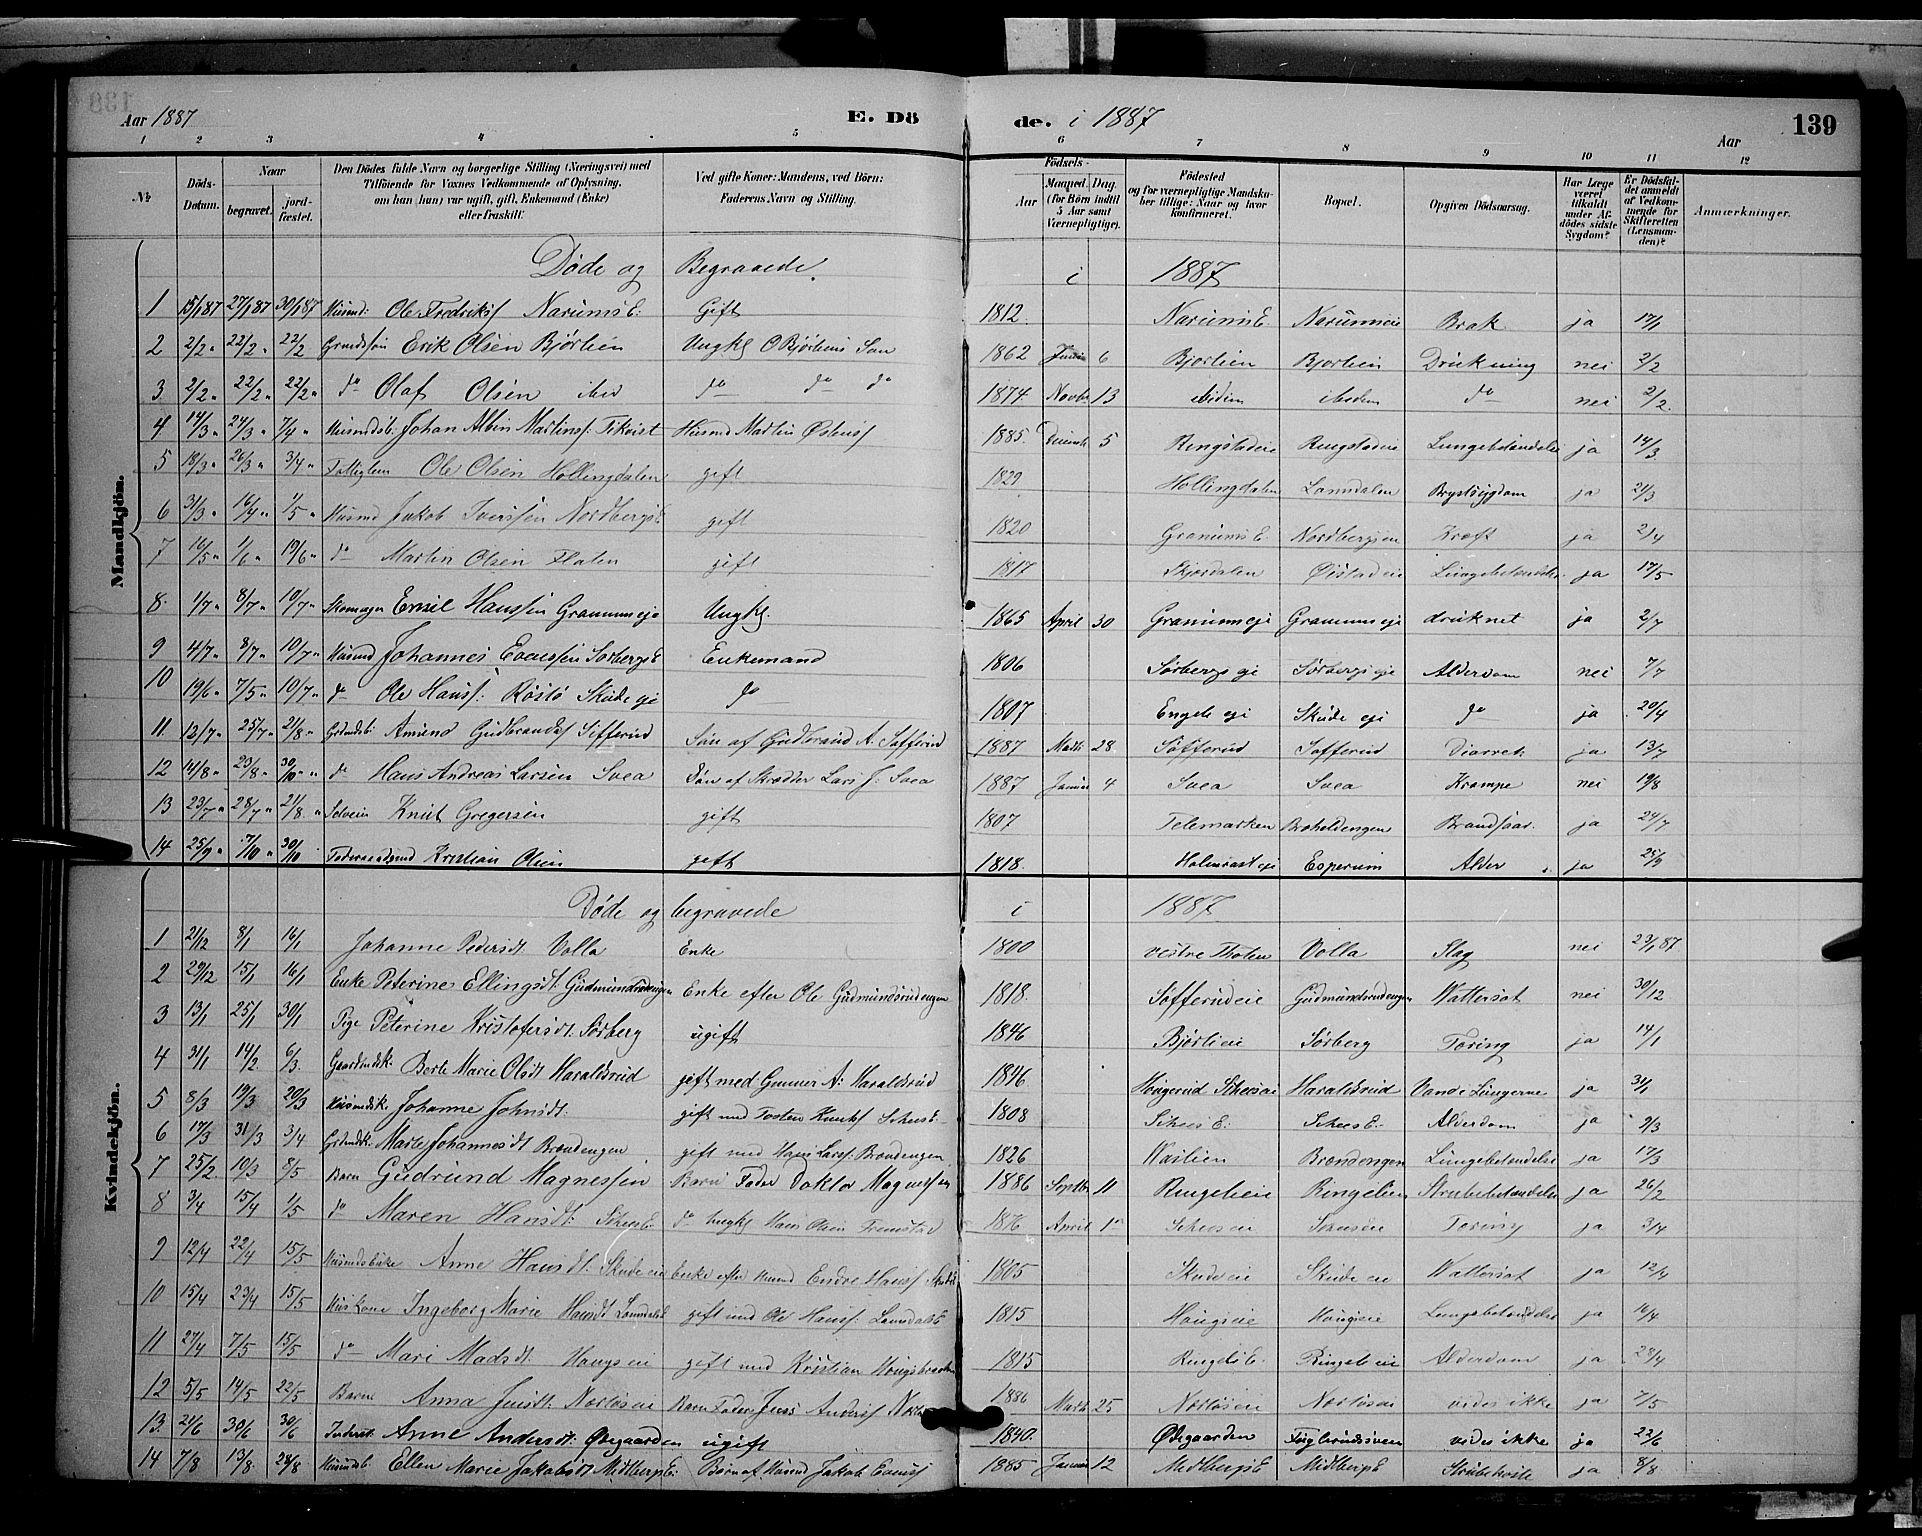 SAH, Søndre Land prestekontor, L/L0002: Klokkerbok nr. 2, 1884-1900, s. 139